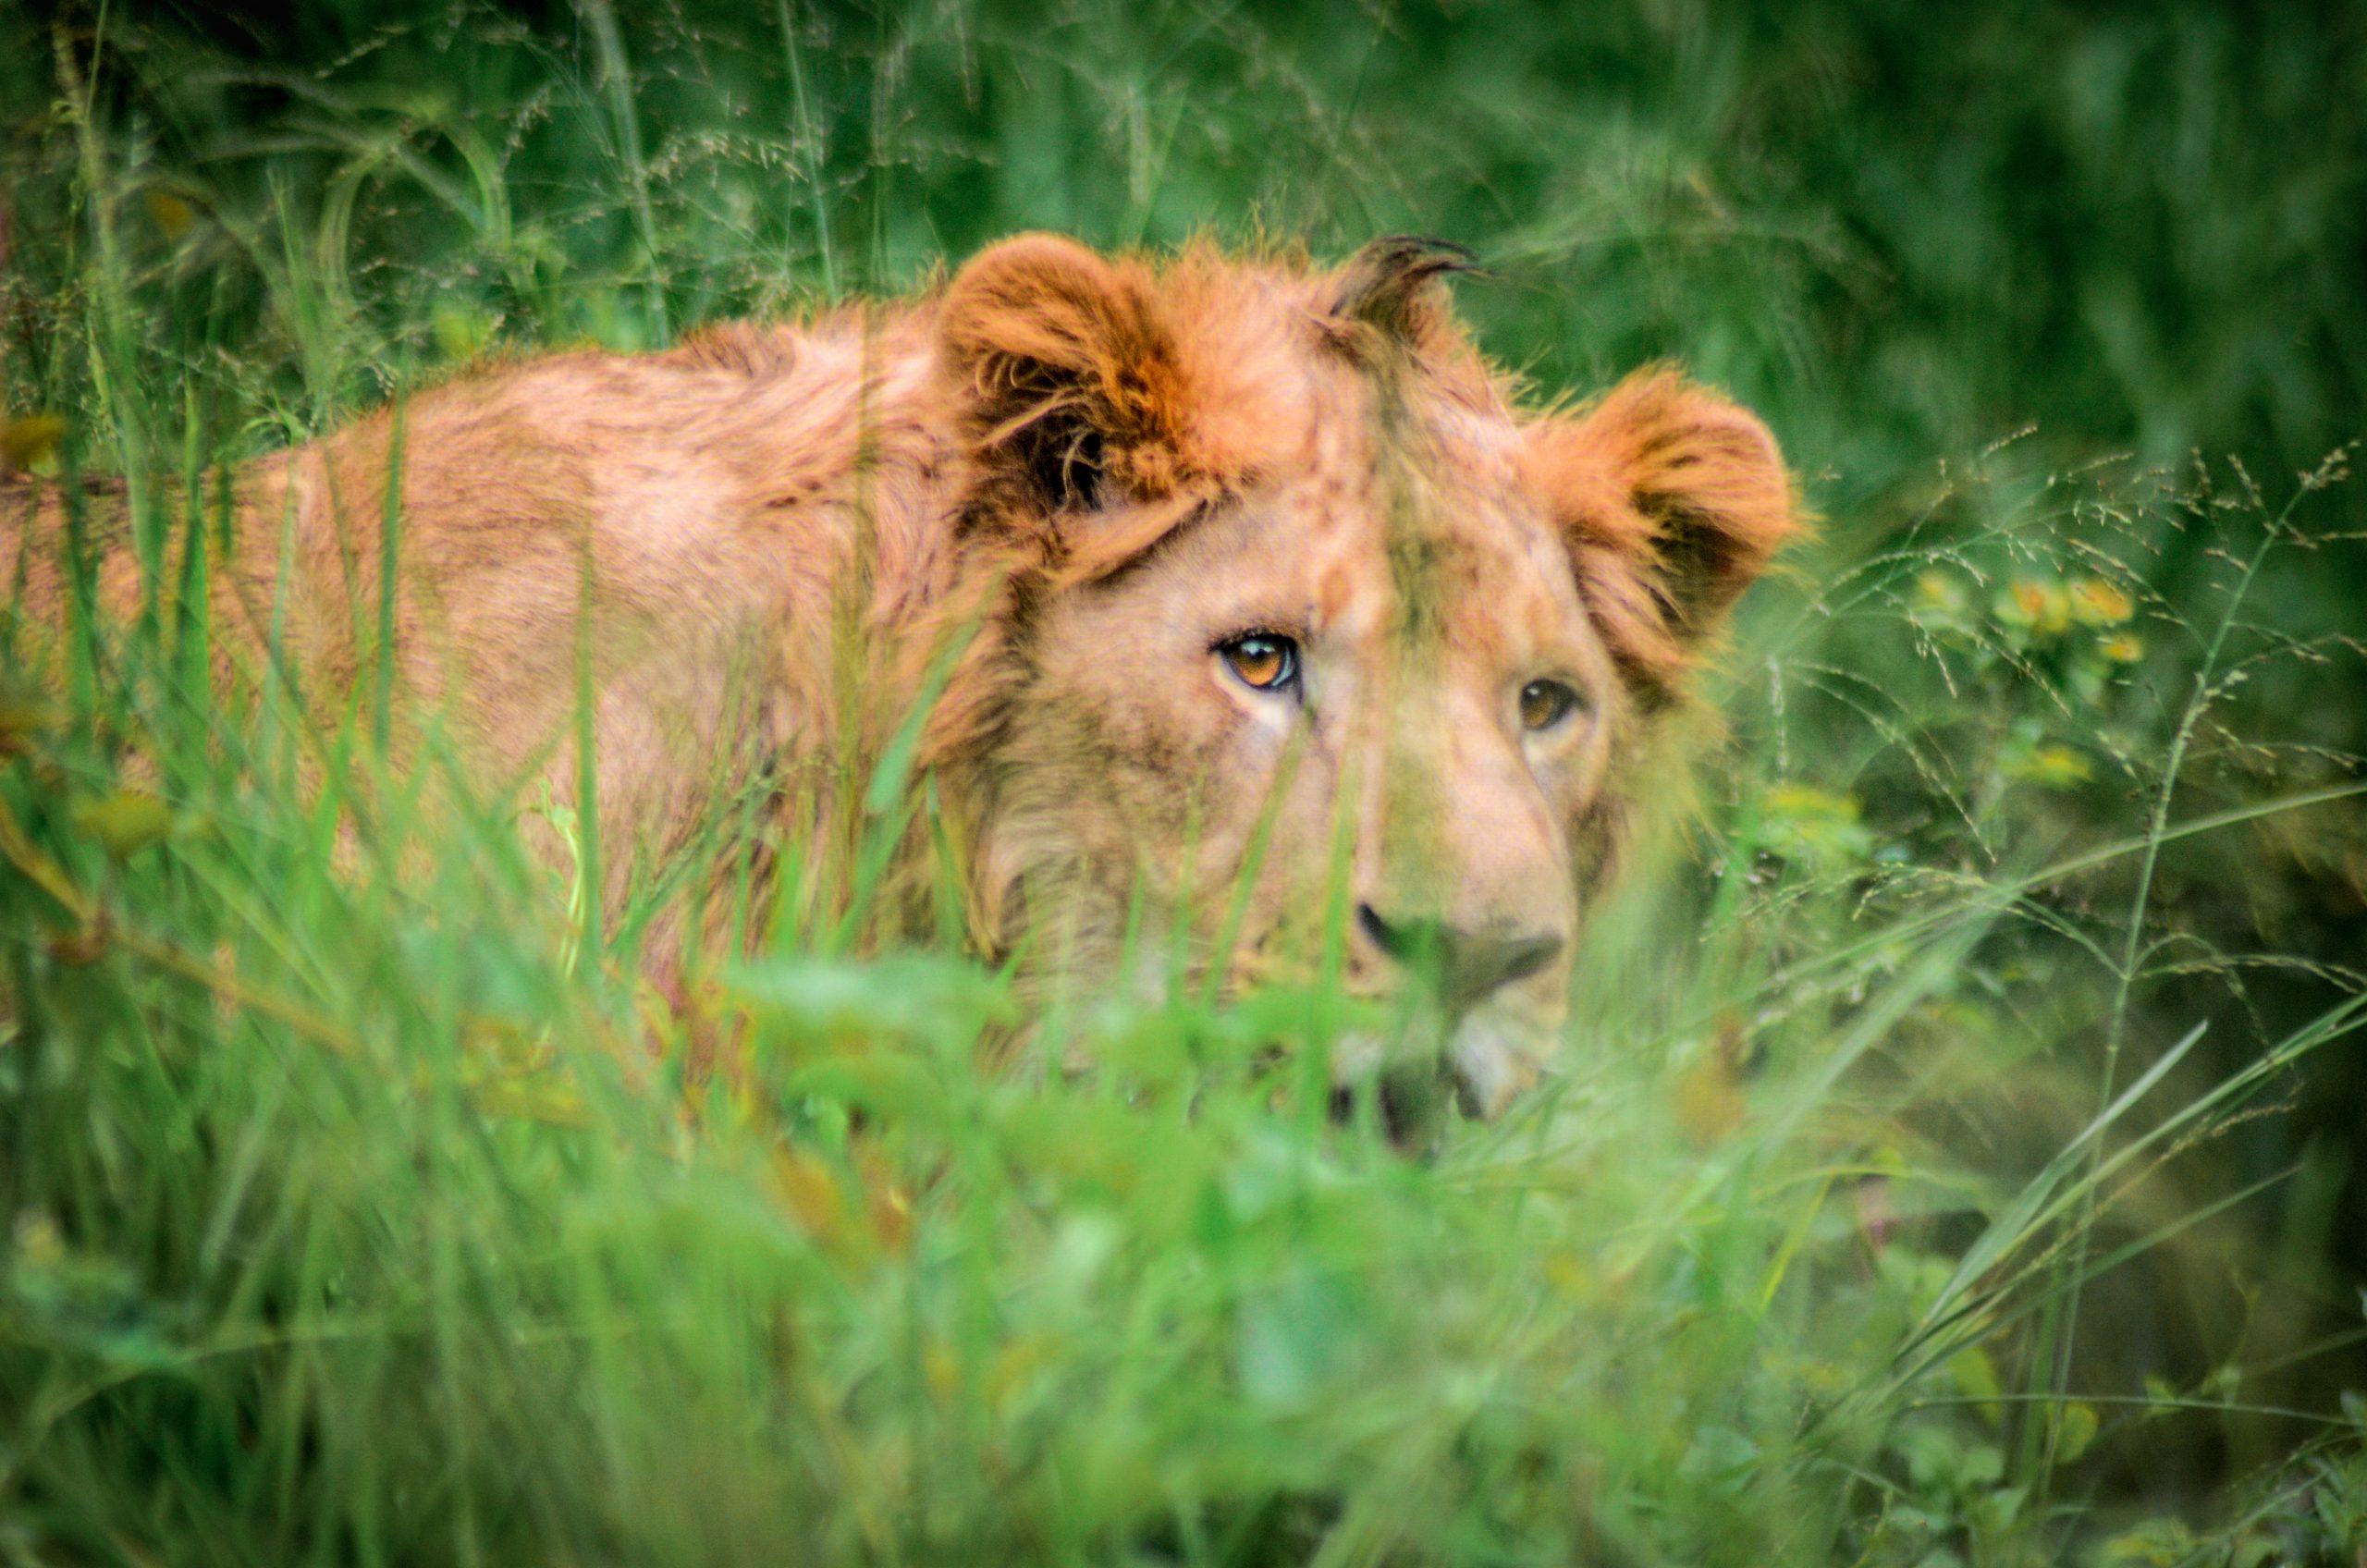 A lion in Bannerghatta Biological park